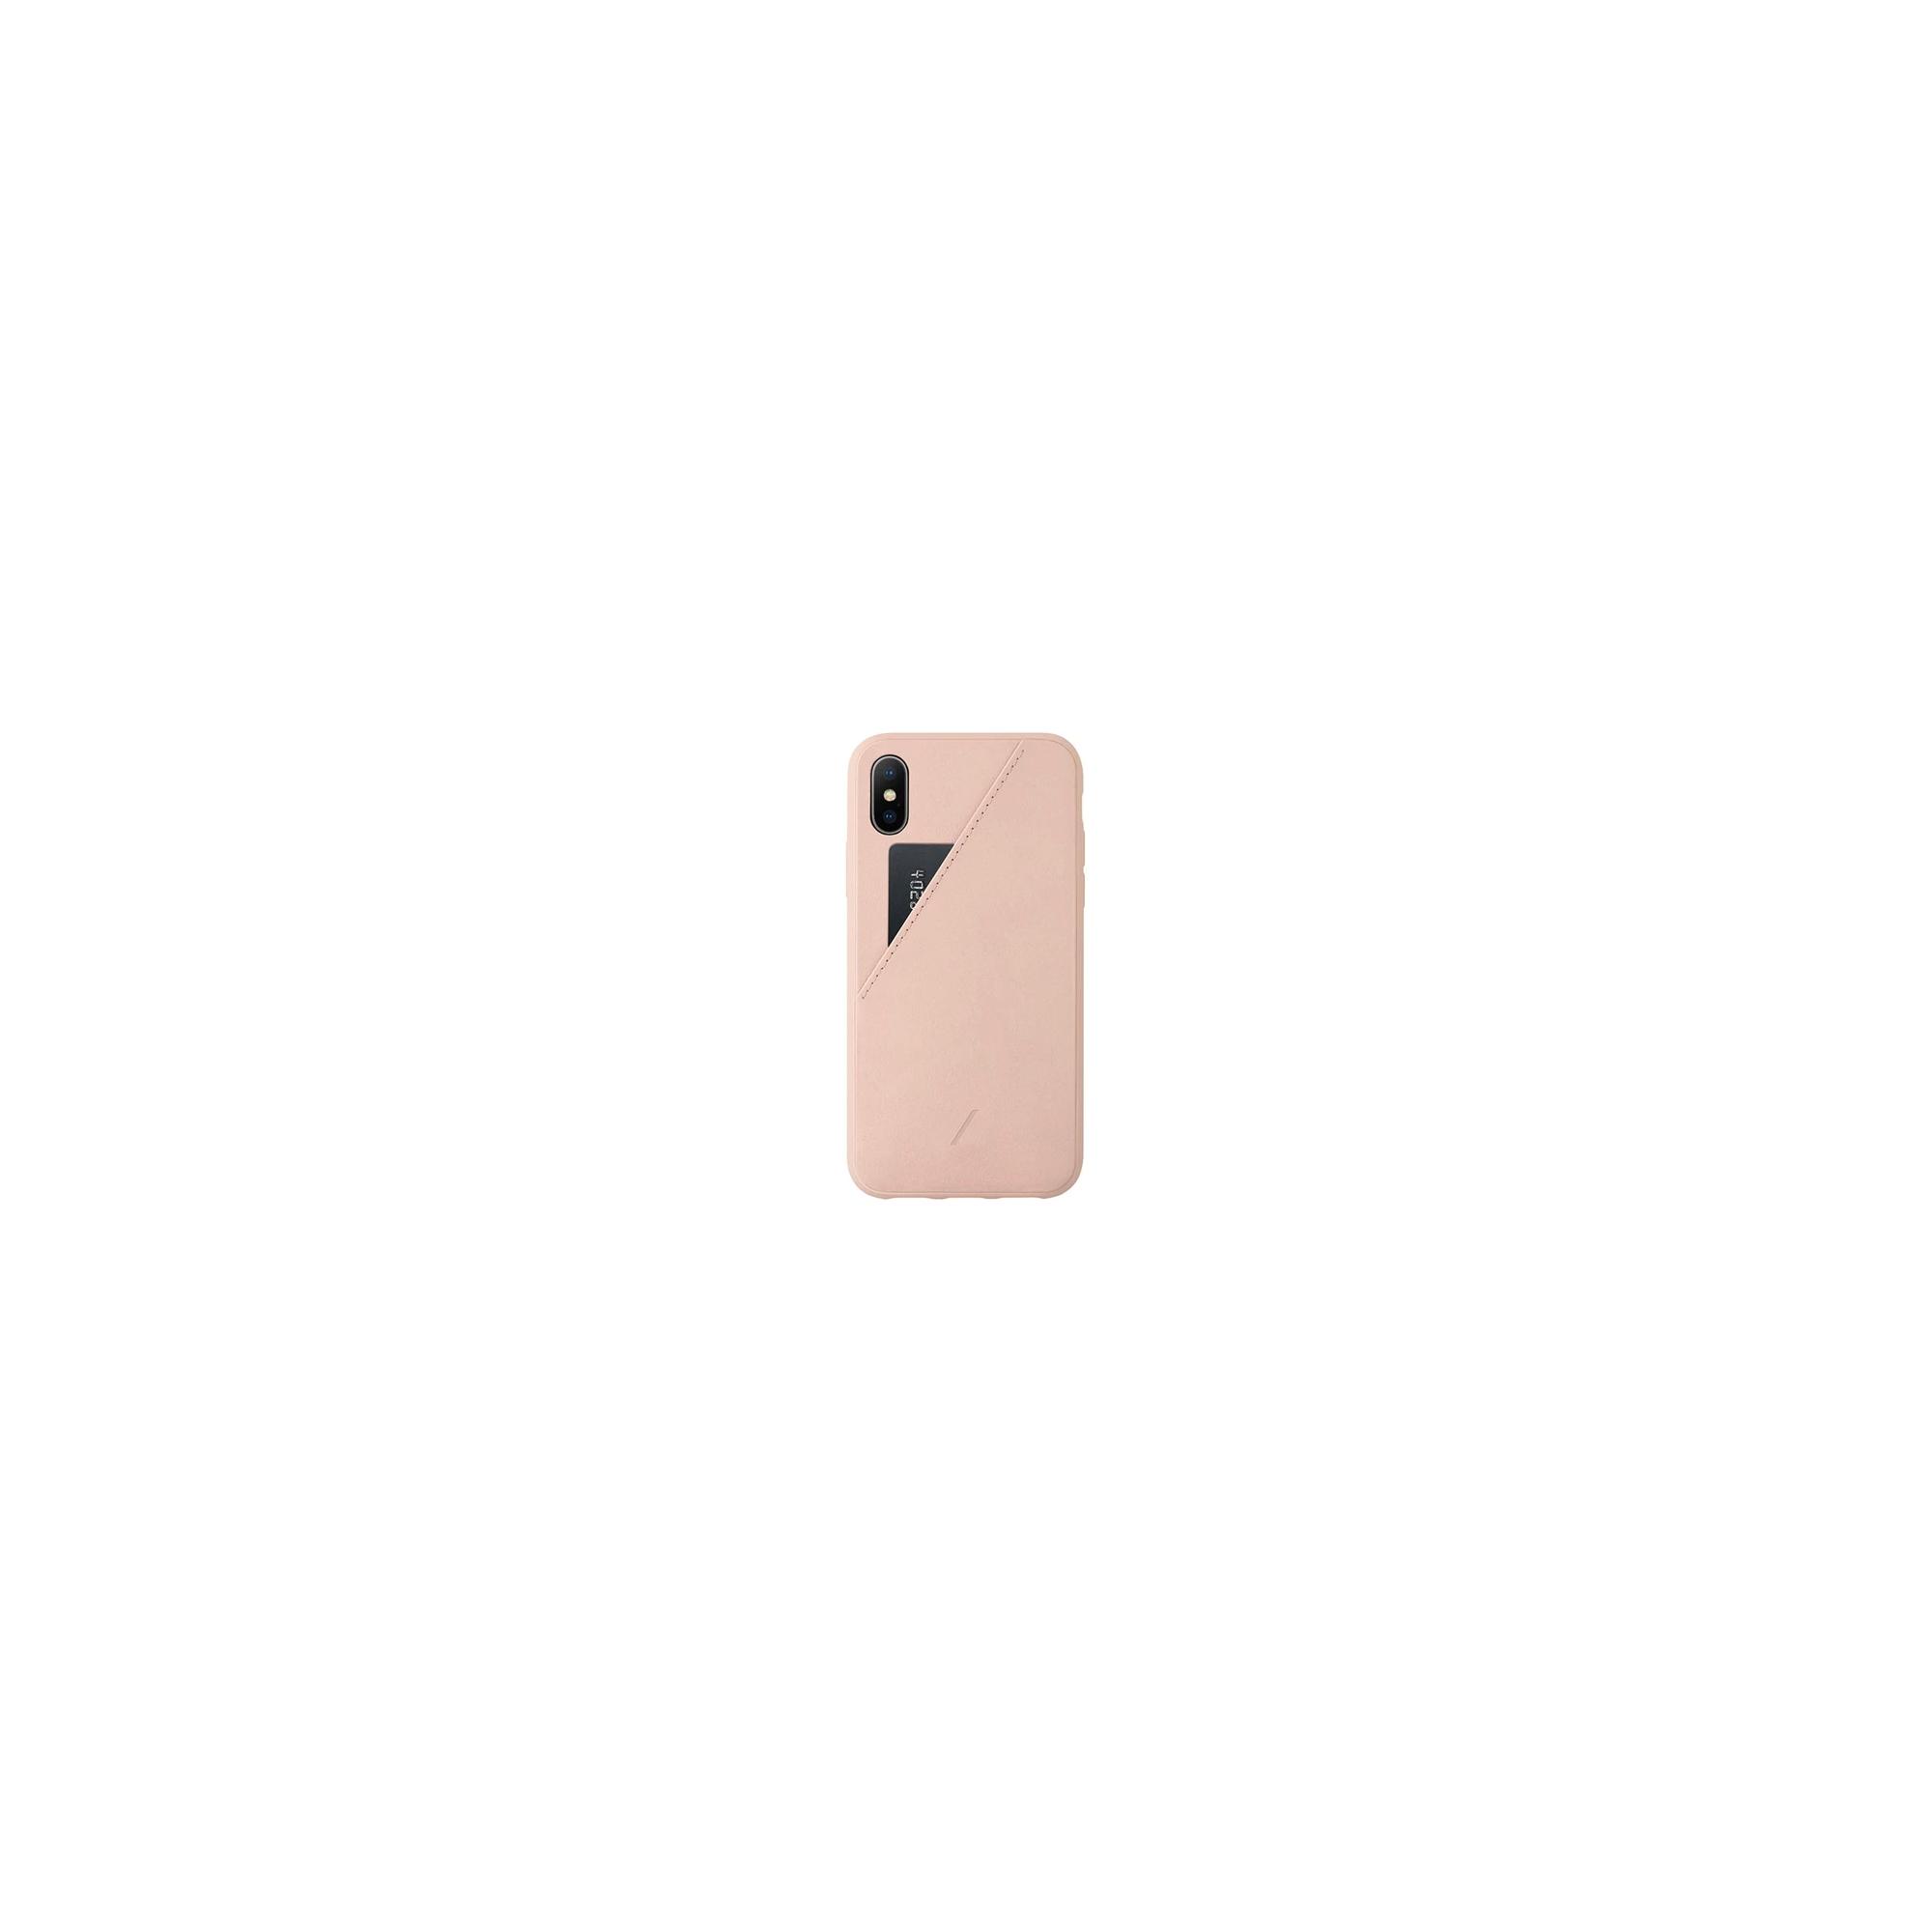 Clic Iphone XS Max - Rose